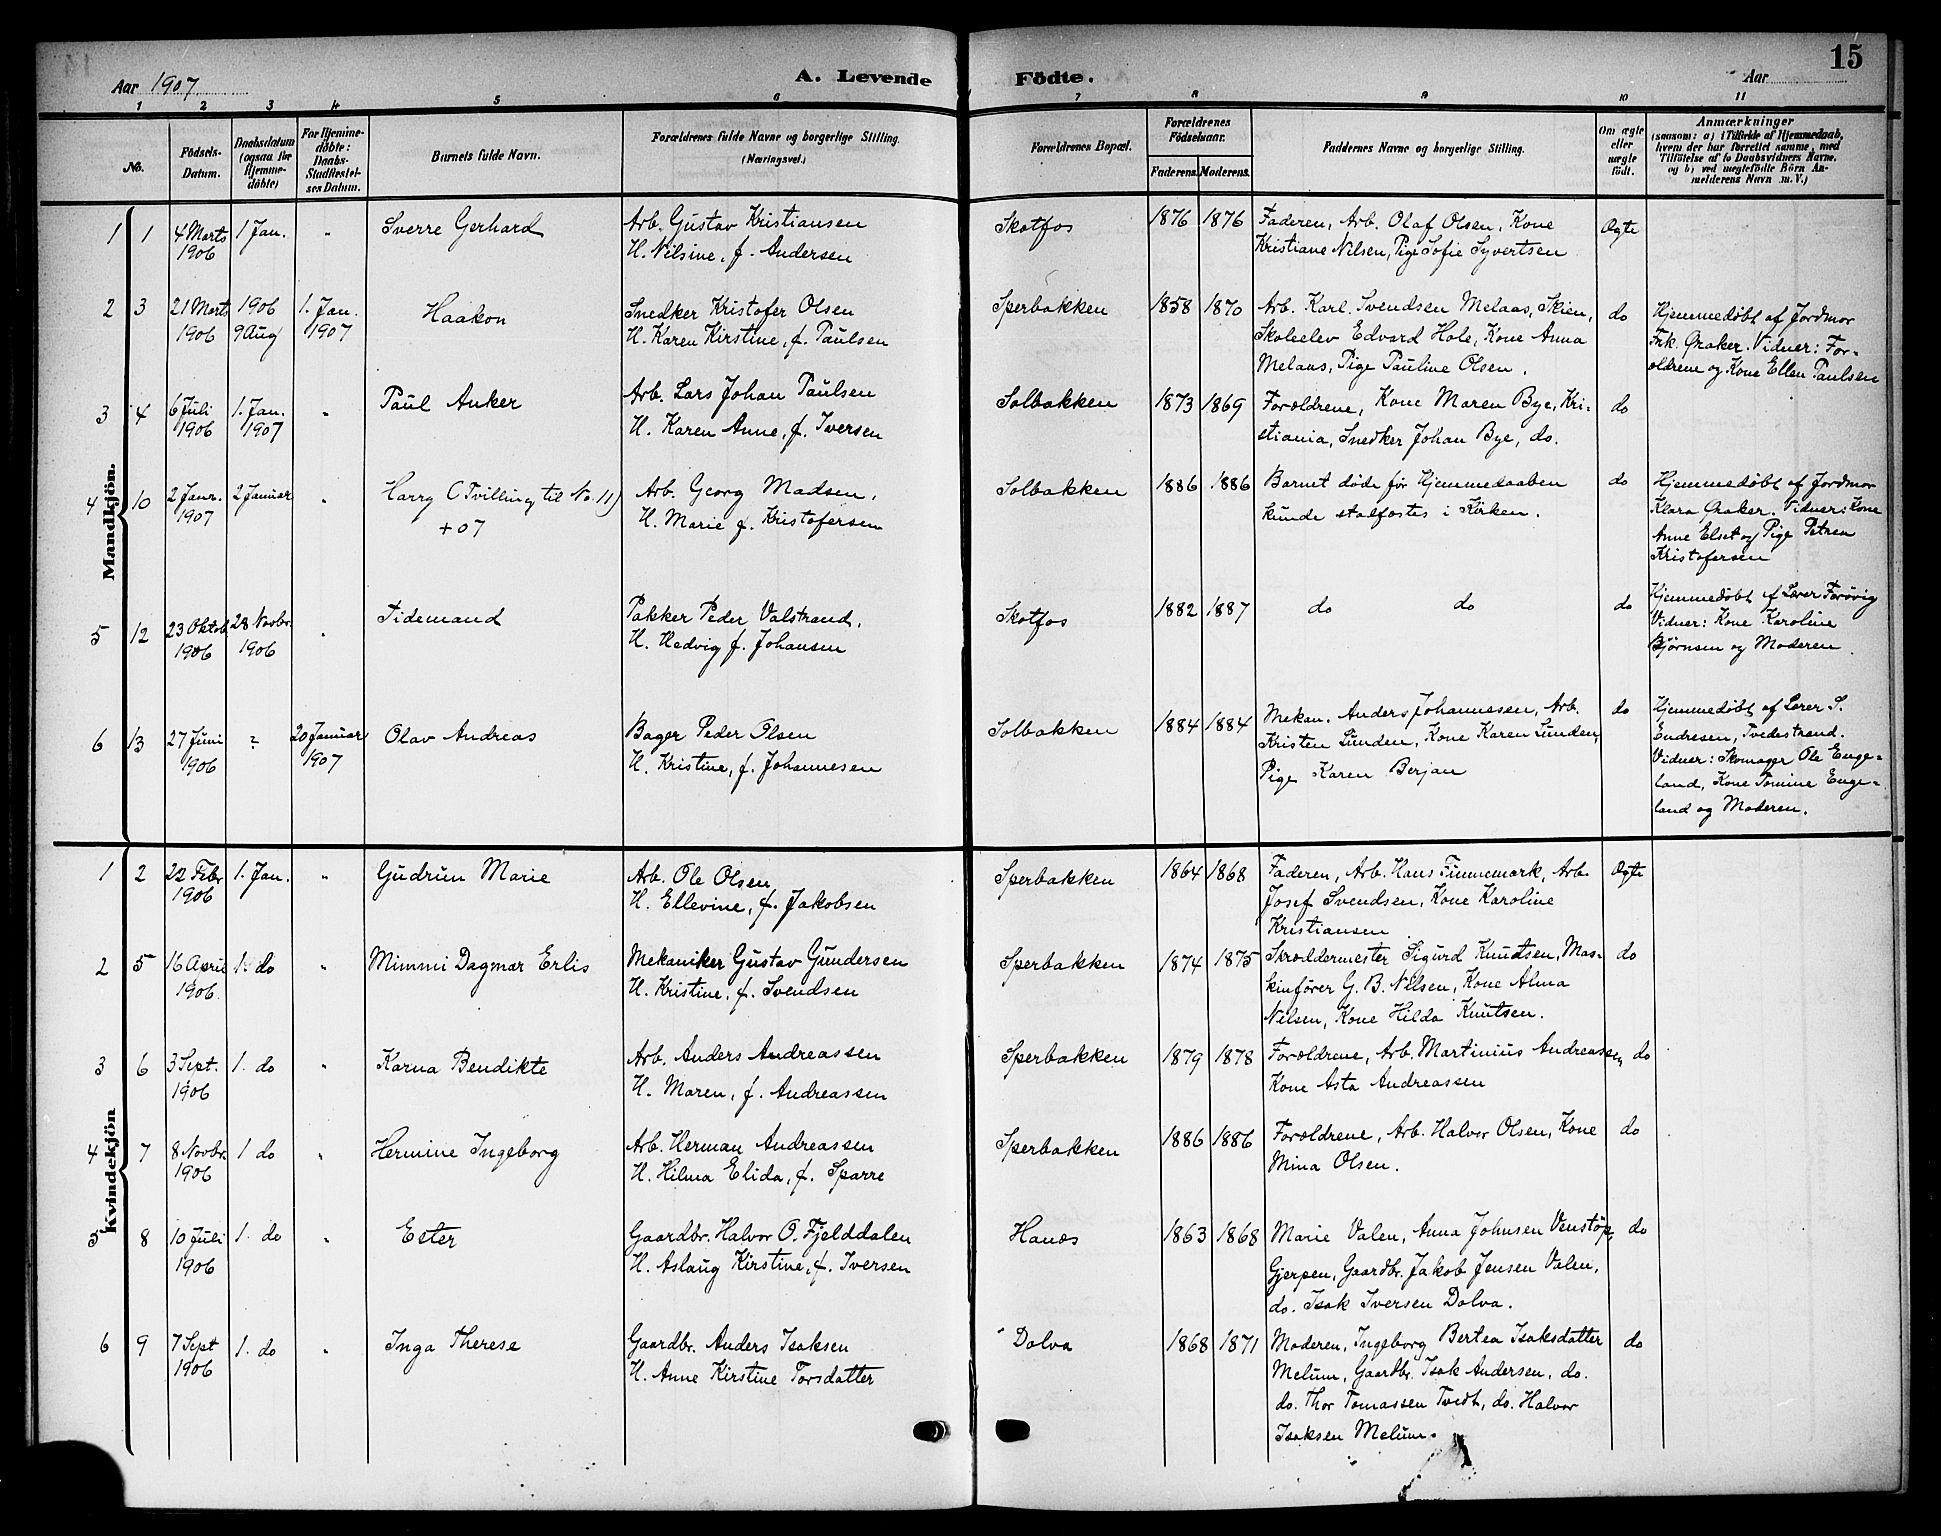 SAKO, Solum kirkebøker, G/Gb/L0005: Klokkerbok nr. II 5, 1905-1914, s. 15